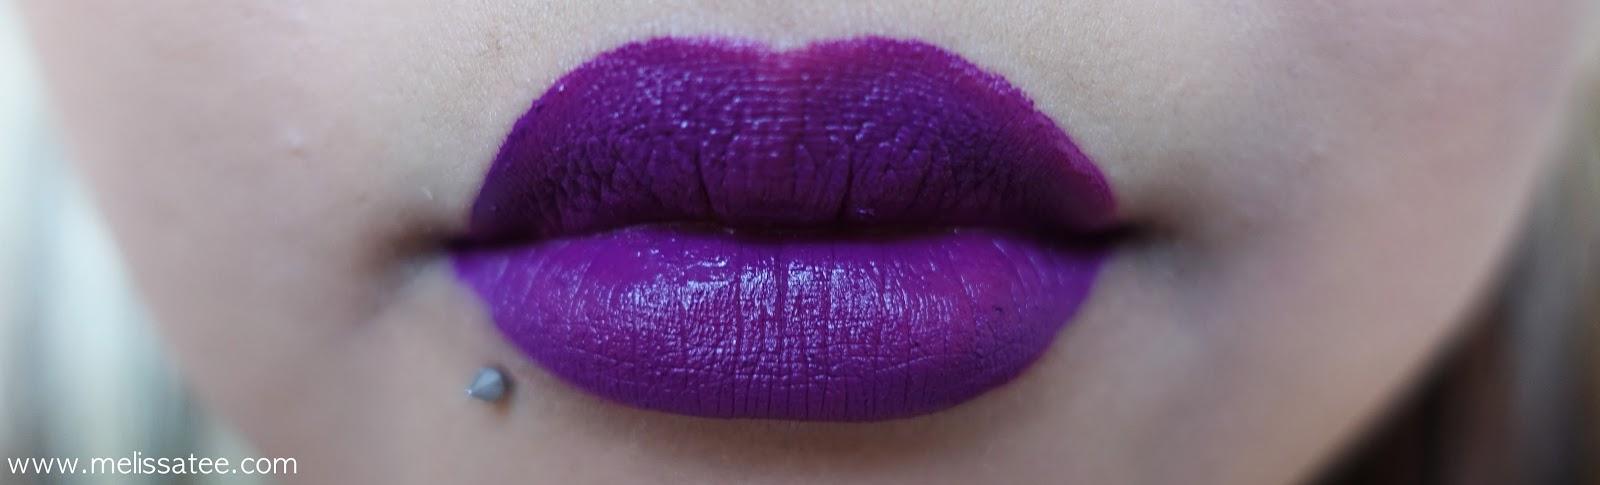 The Blushing Introvert: Top 5 Liquid Lipsticks